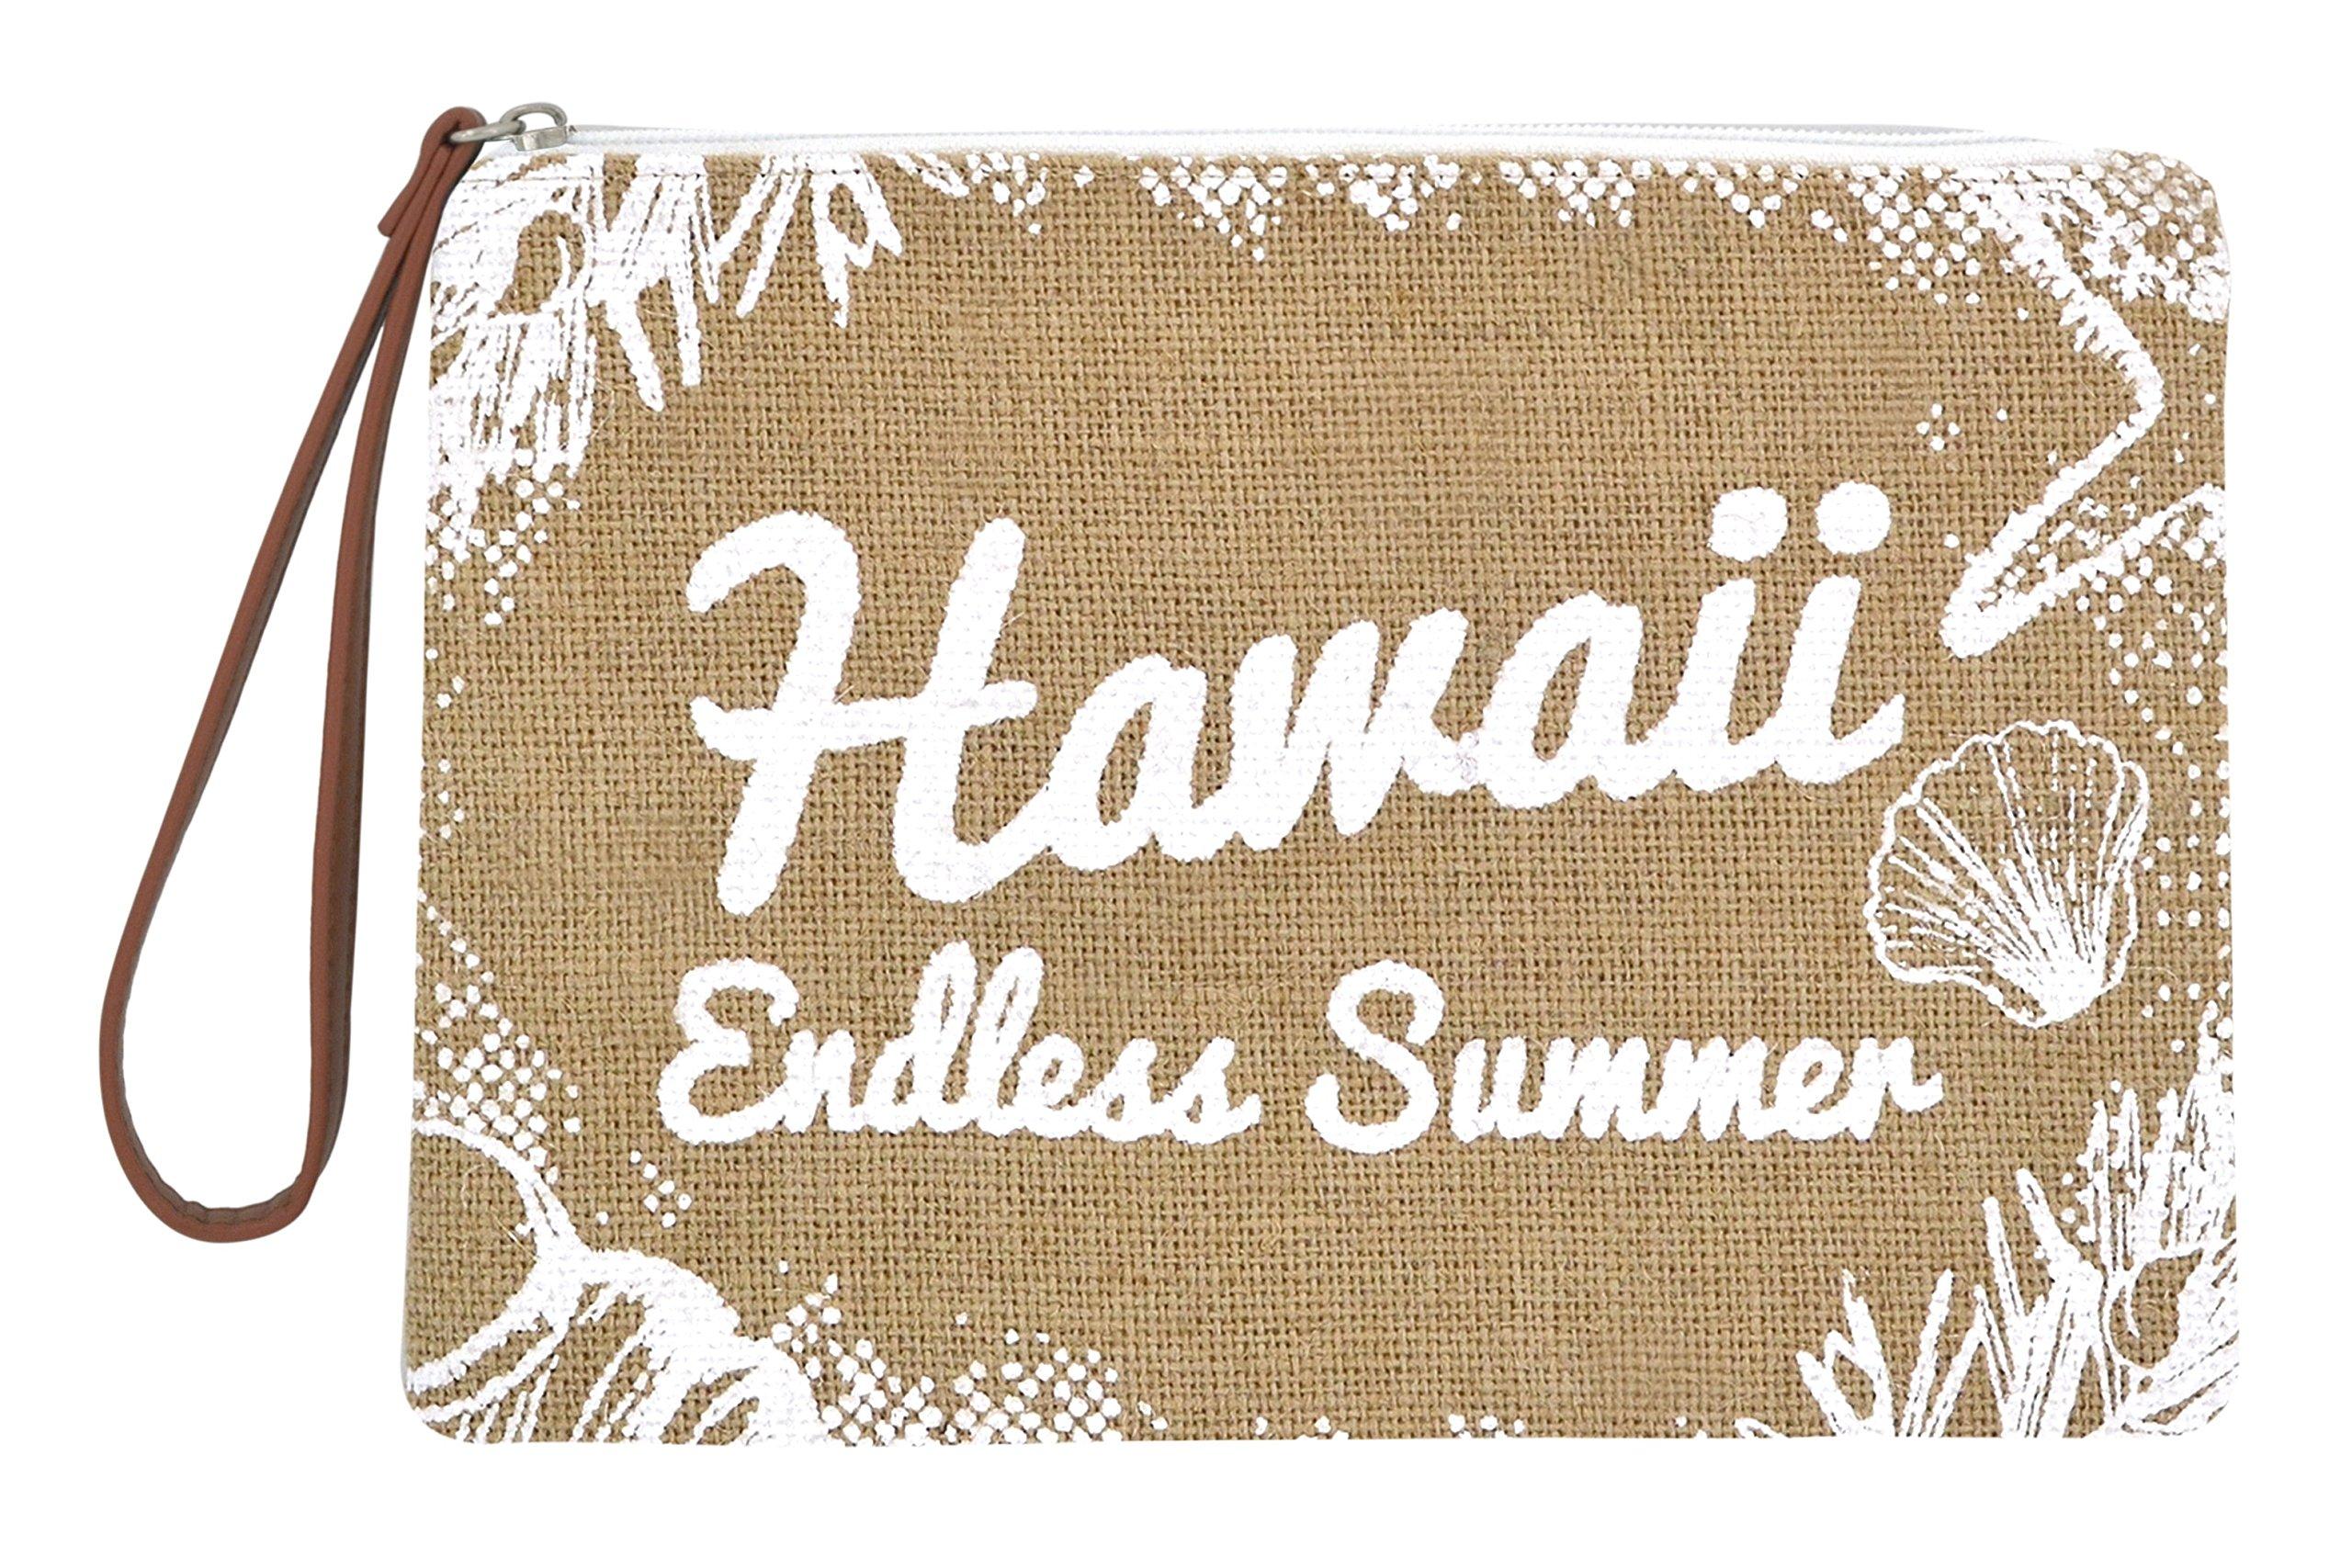 Seven Island Women Leather Canvas Cute Tropical Pineapple Print Unisex Portable Travel Evening Cosmetic Makeup Zipper Purse Wrist Pouch Clutch (Hawaii Endless Summer)